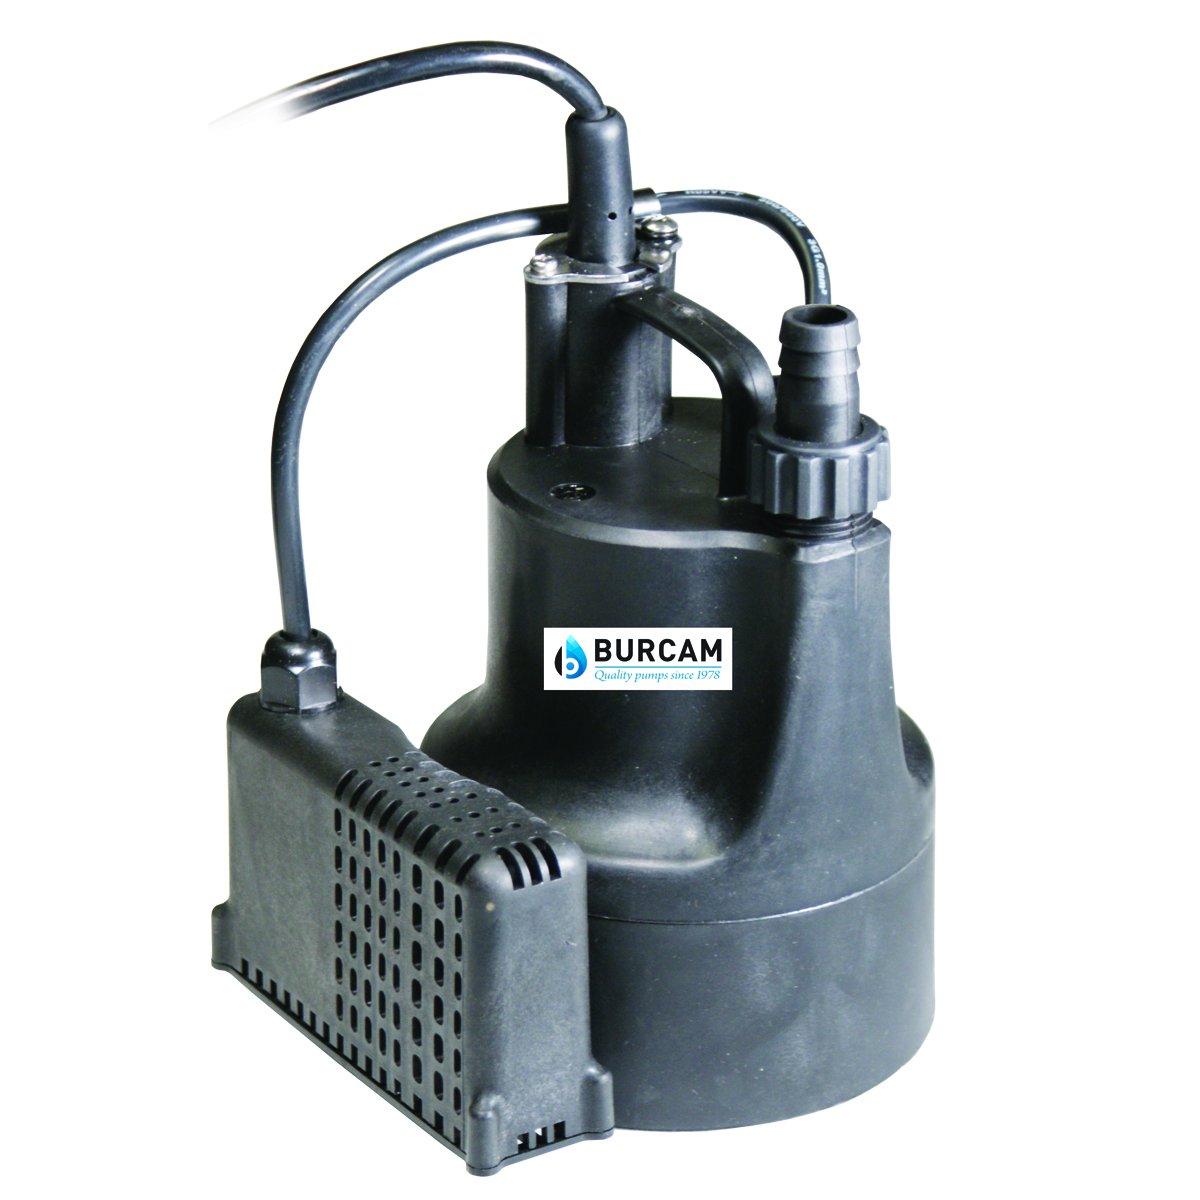 BURCAM 300506S 1/6 HP Automatic Dewatering Utility Pump, Black